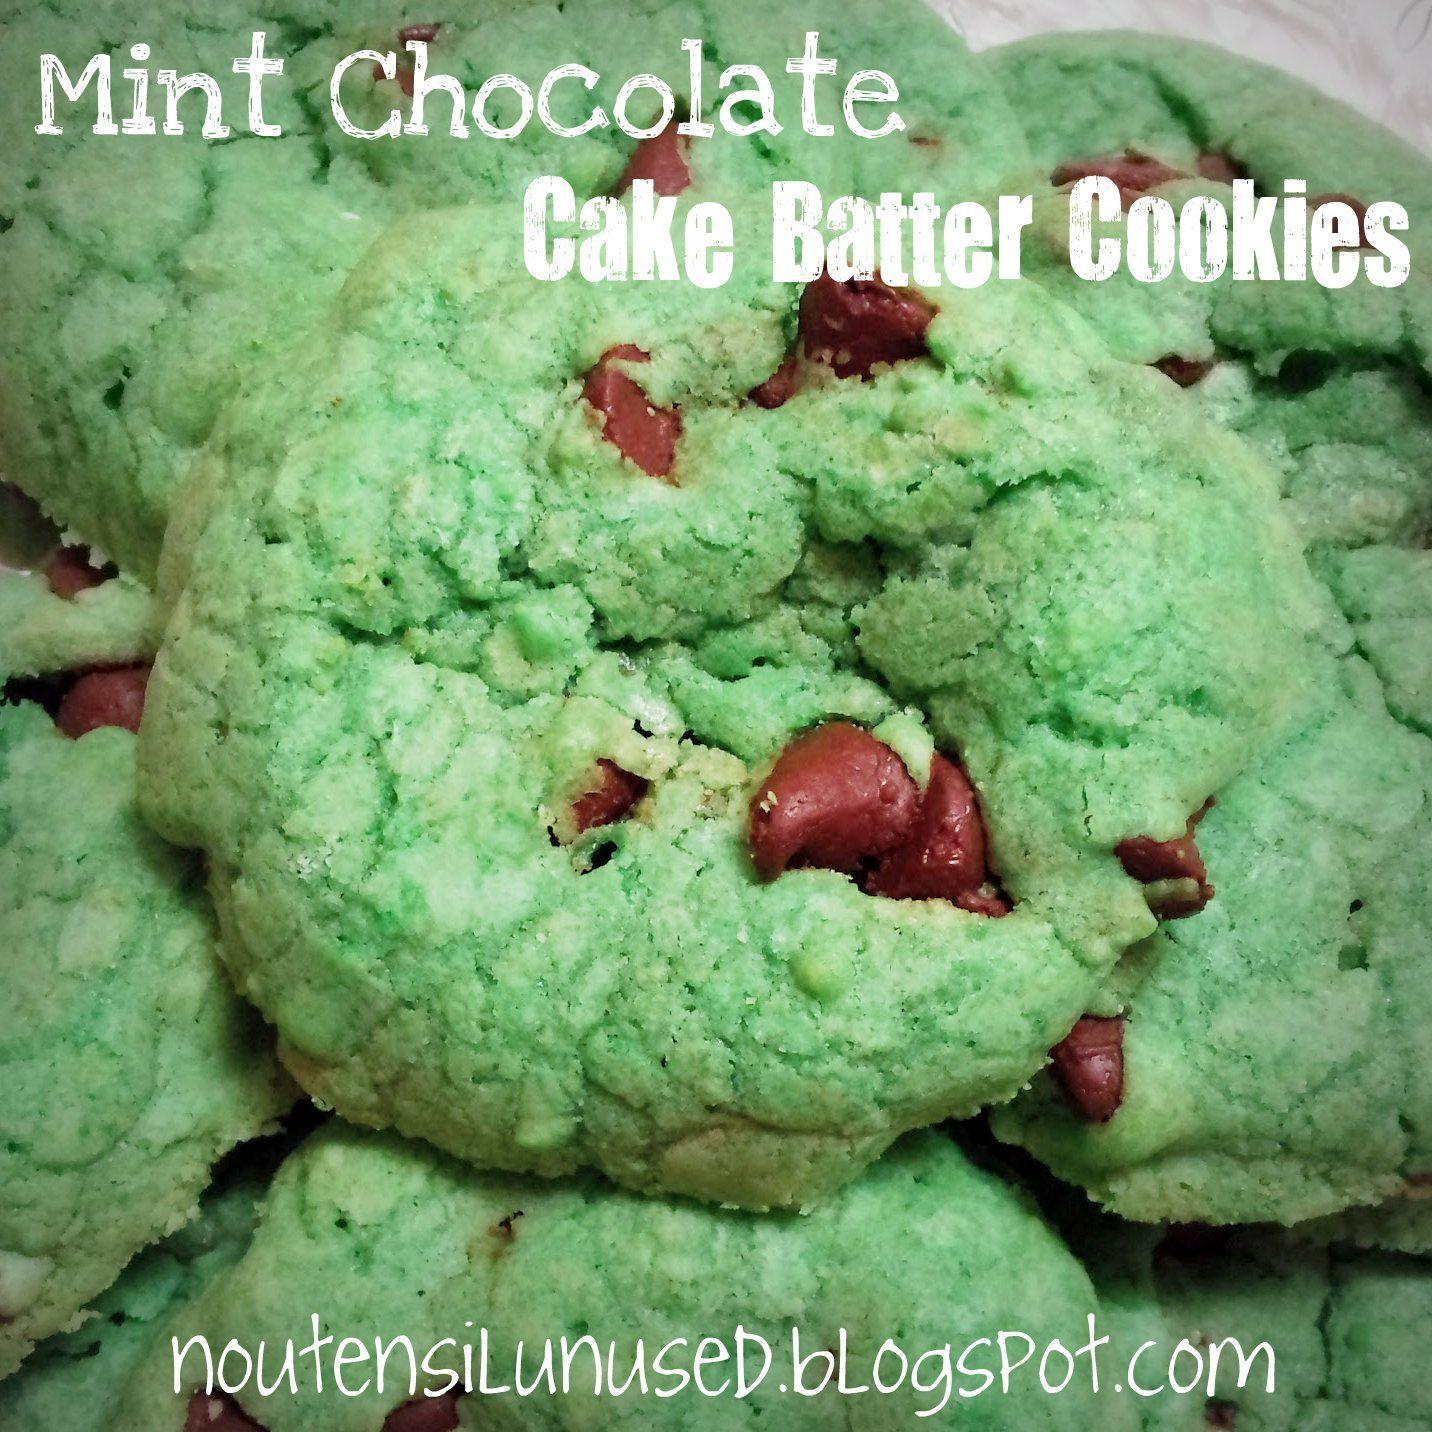 Mint Chocolate Cake Batter Cookies Recipe | No Utensil Unused